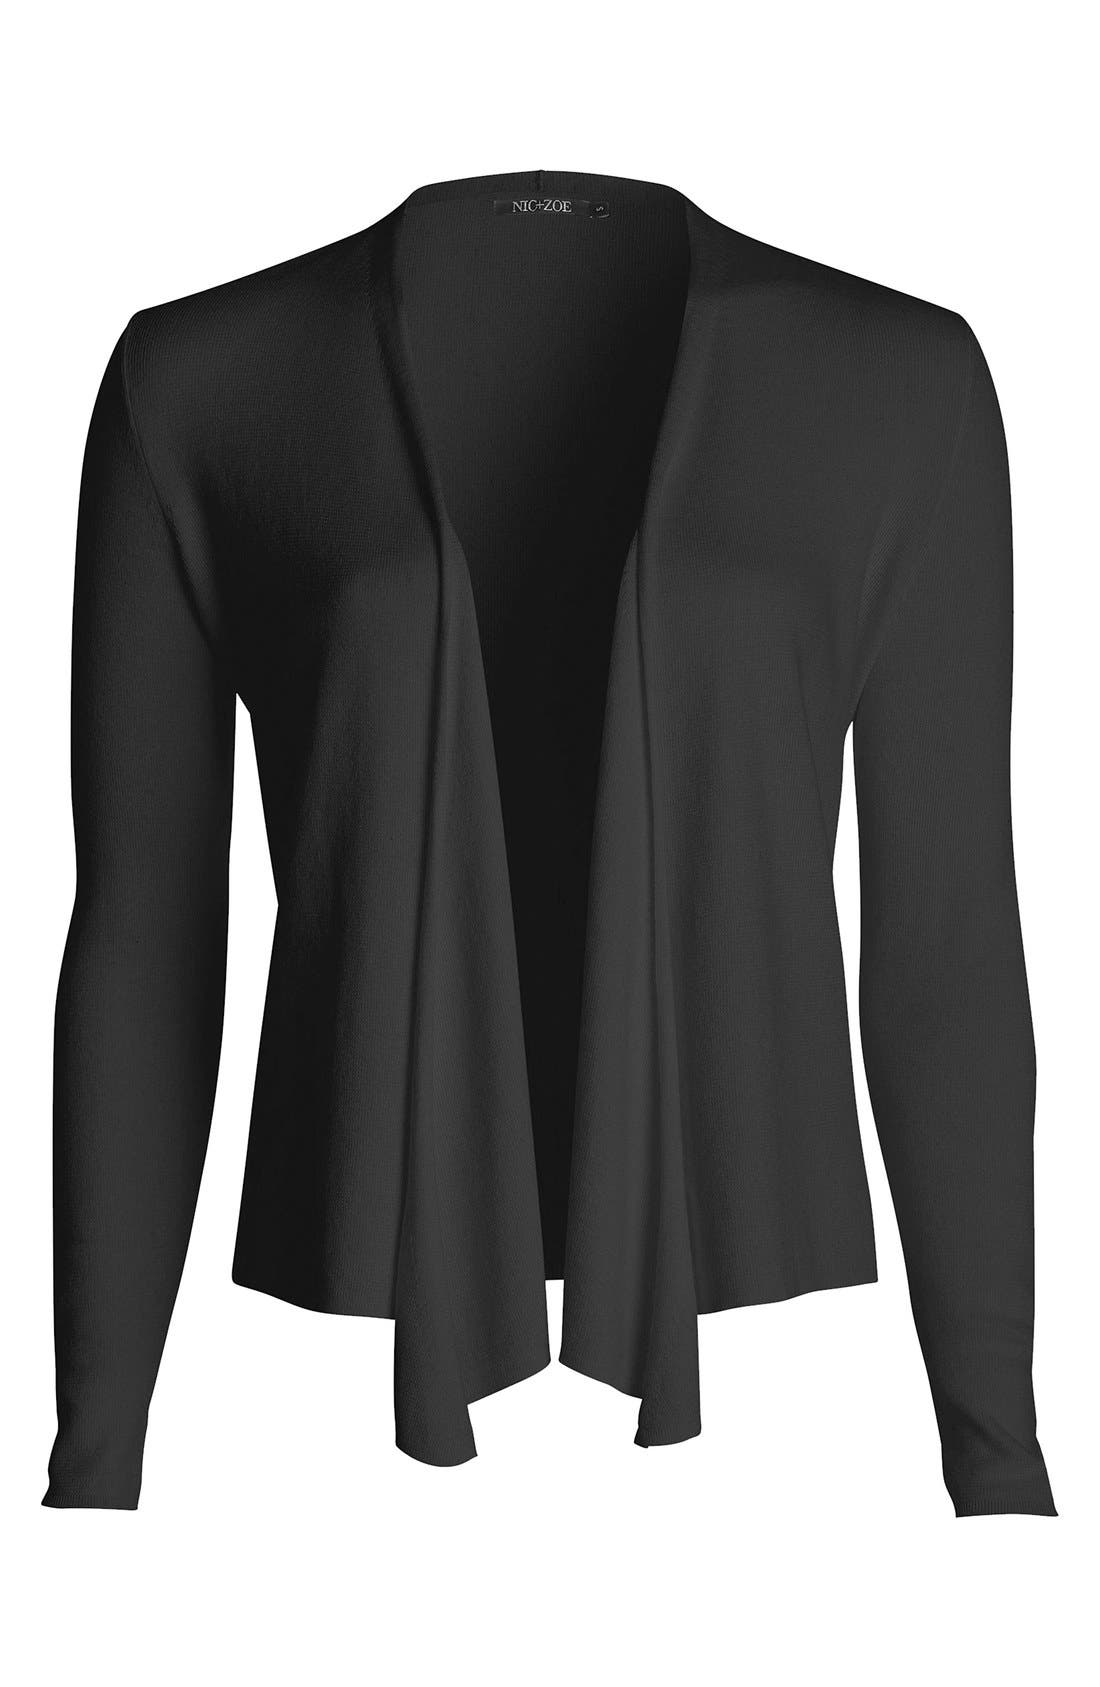 Four-Way Convertible Cardigan,                             Alternate thumbnail 5, color,                             BLACK ONYX